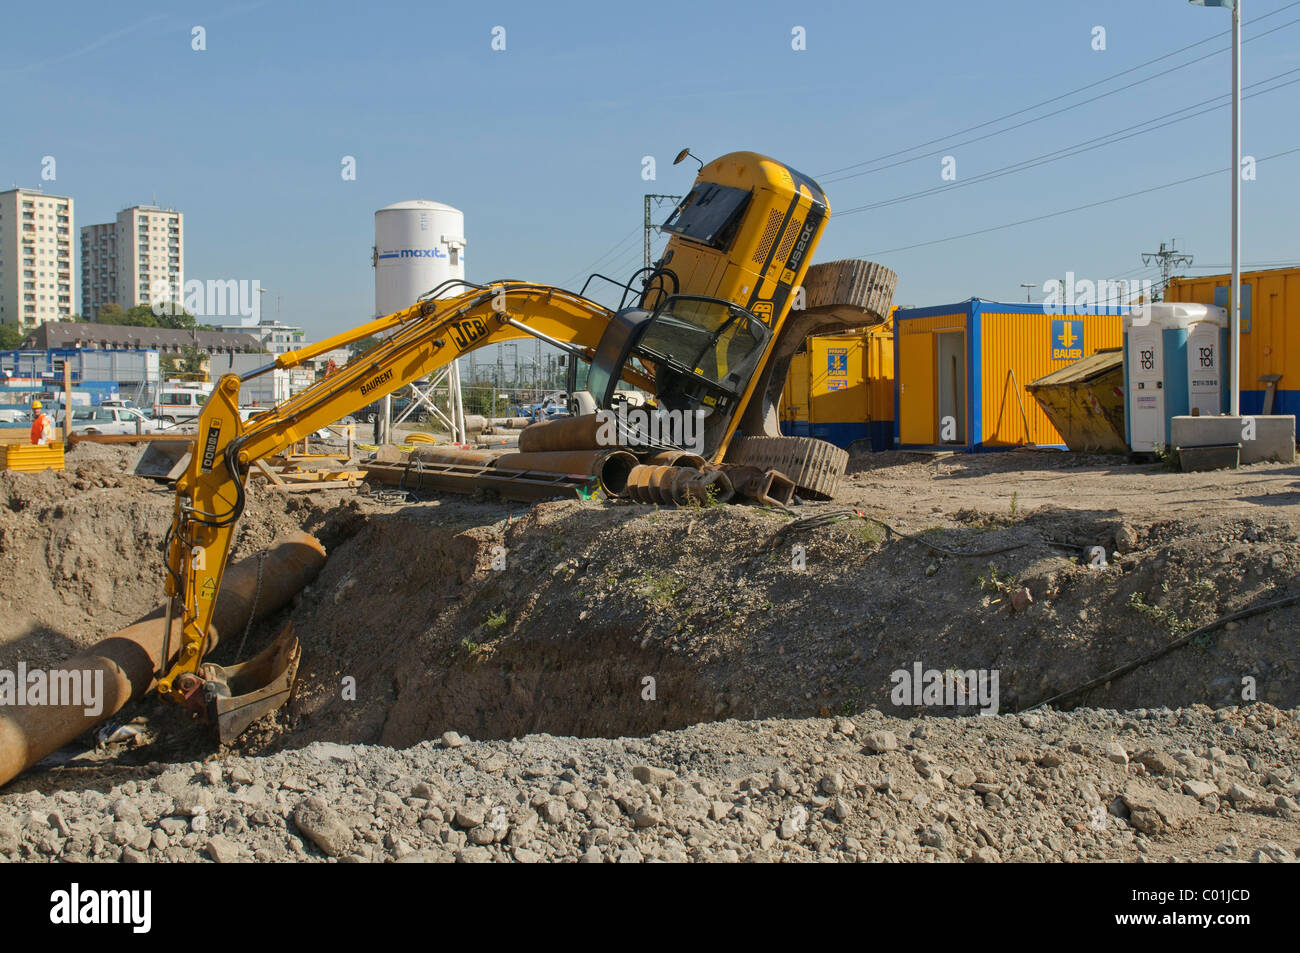 A crawler excavator toppled over on the construction site between Neue Bibliothek and Pariser Platz, Stuttgart Stock Photo